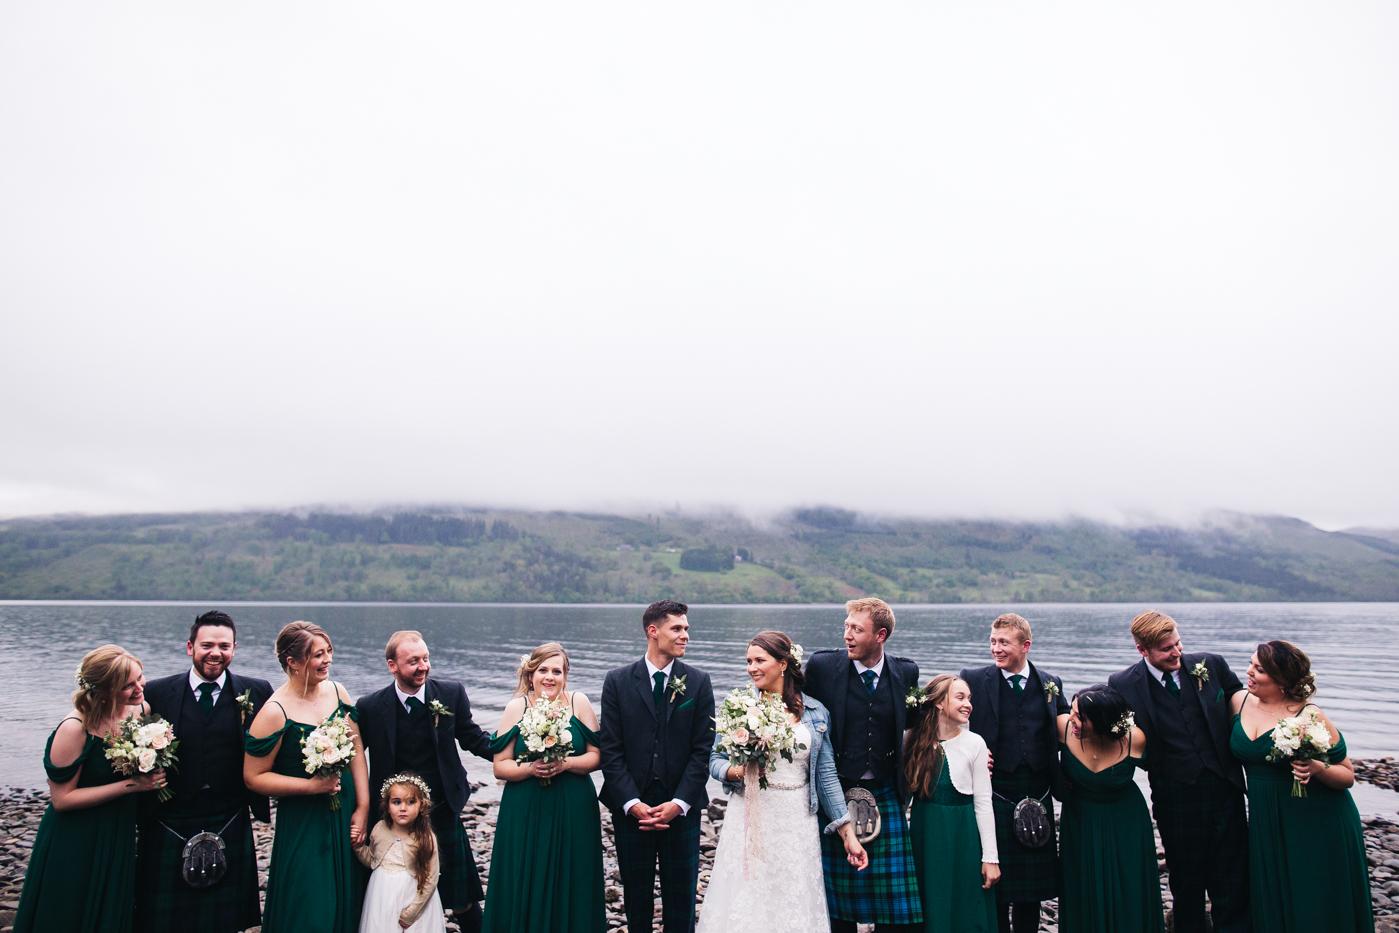 scottish-wedding-trossachs-loch-tay-highlannds-relaxed-photography-photographer-0050.jpg